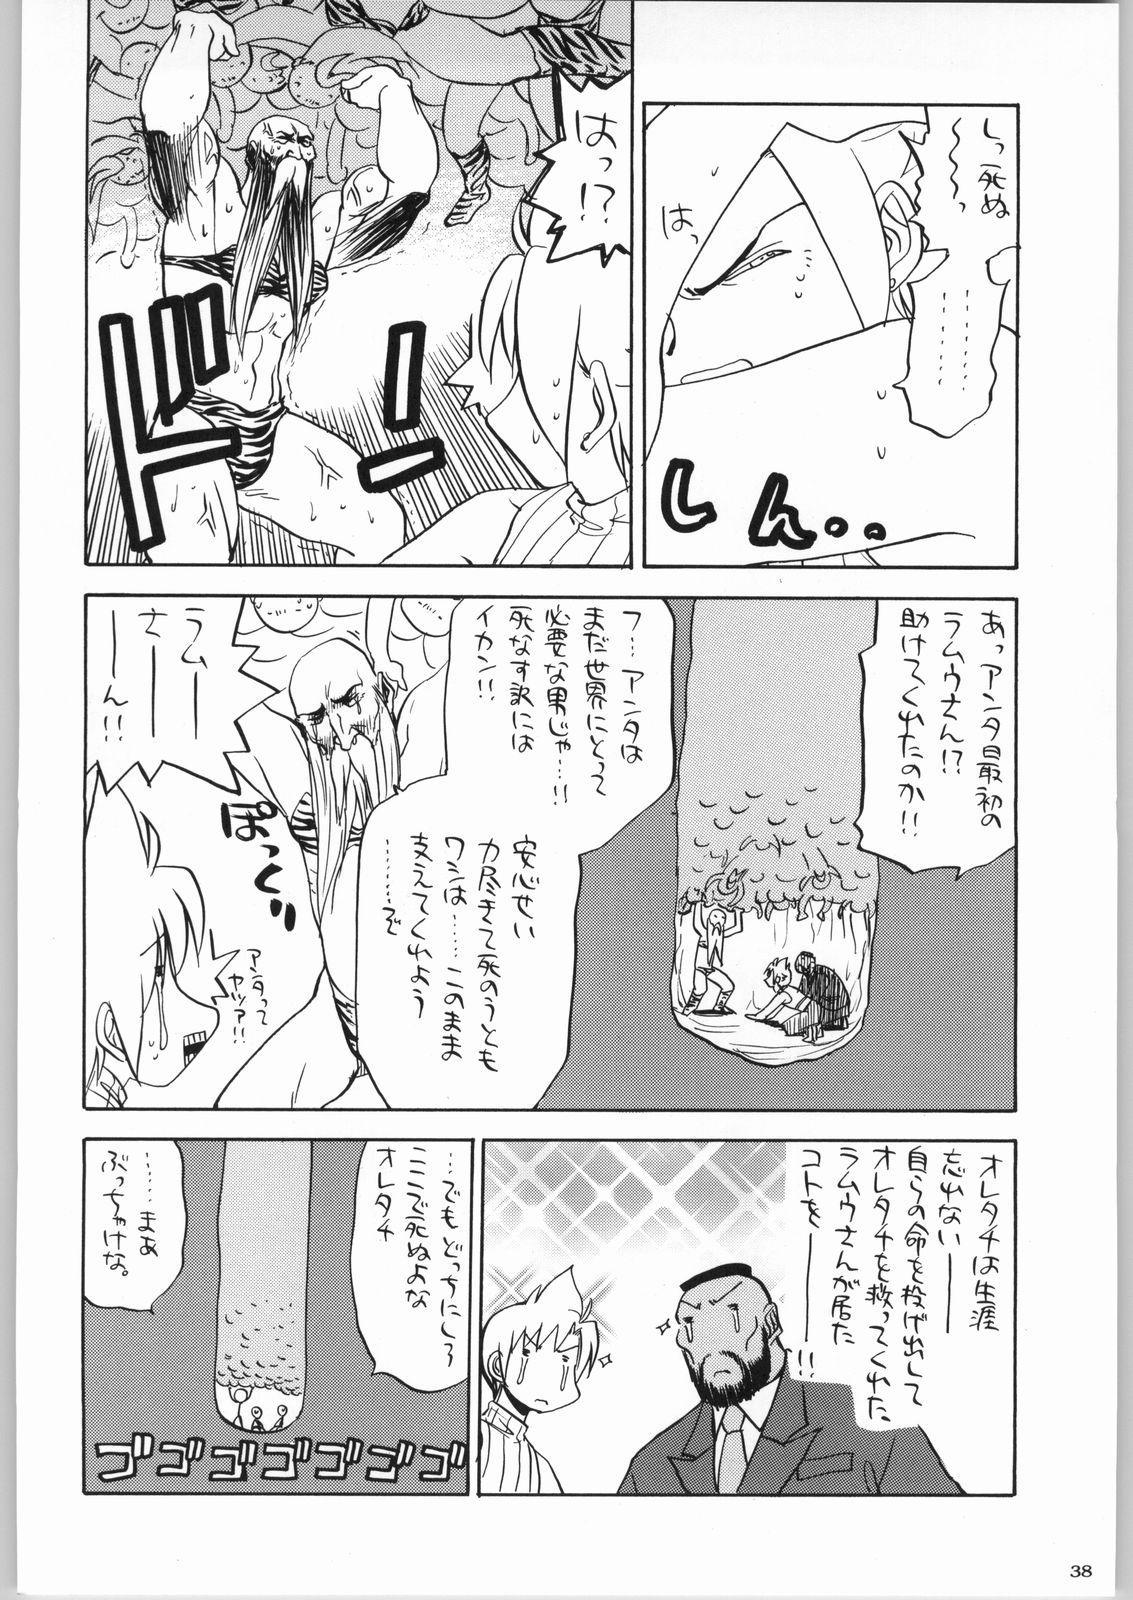 Kabushikigaisha Liver-Sashi 36